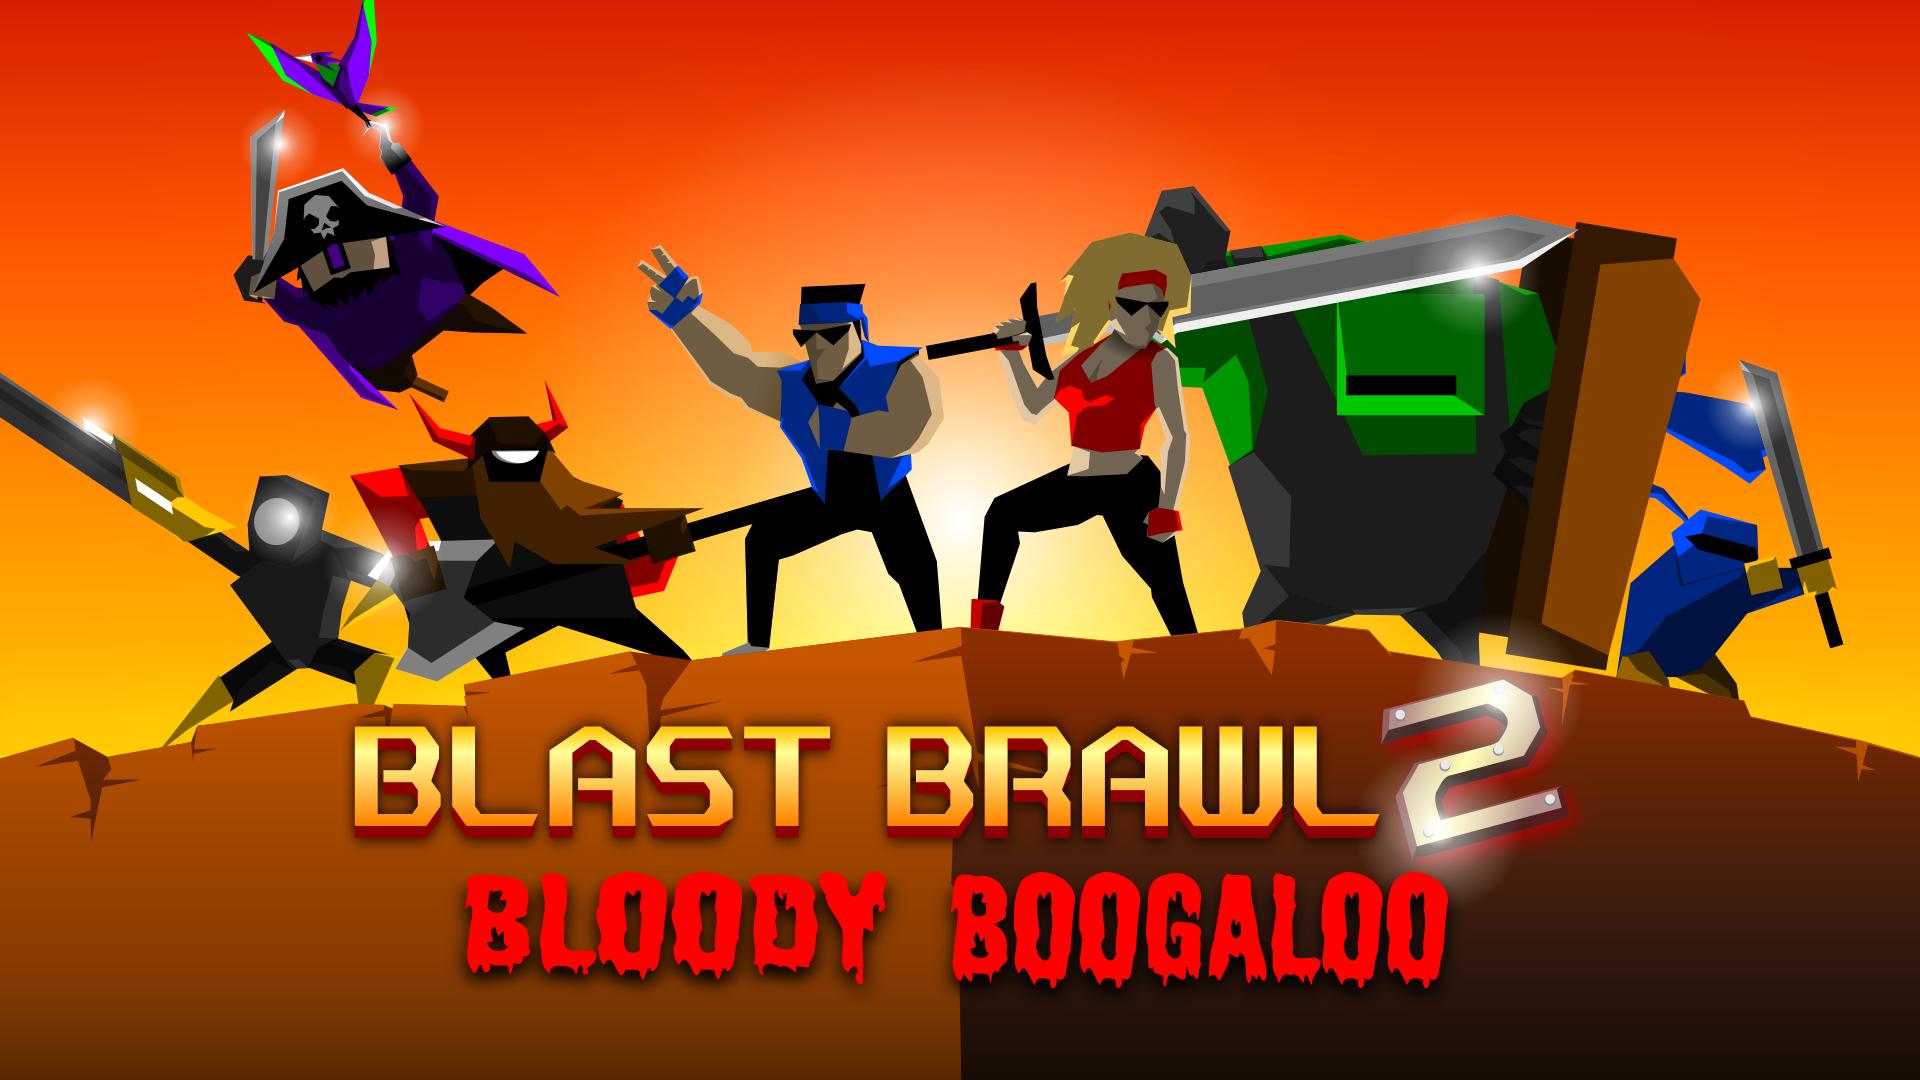 Blast Brawl 2